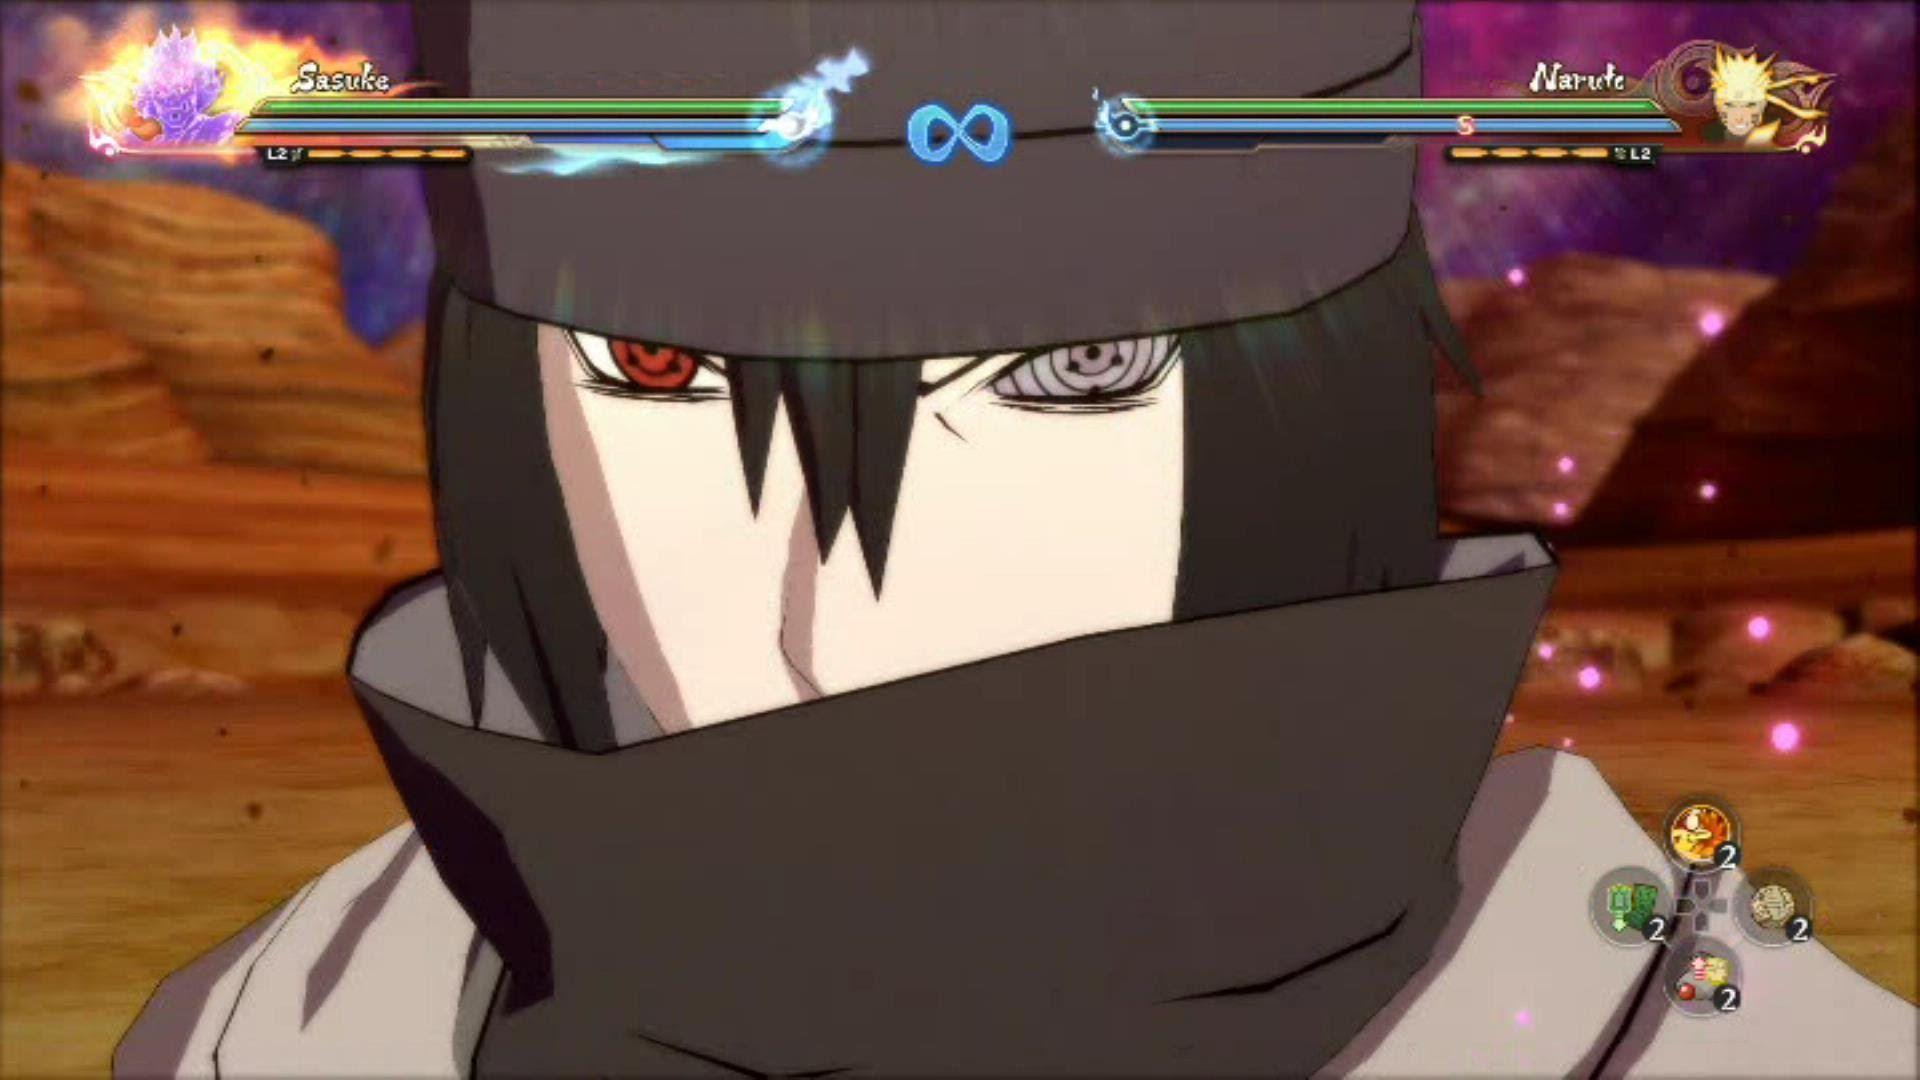 Naruto Shippuden Ultimate Ninja Storm 4: All Characters Awakening